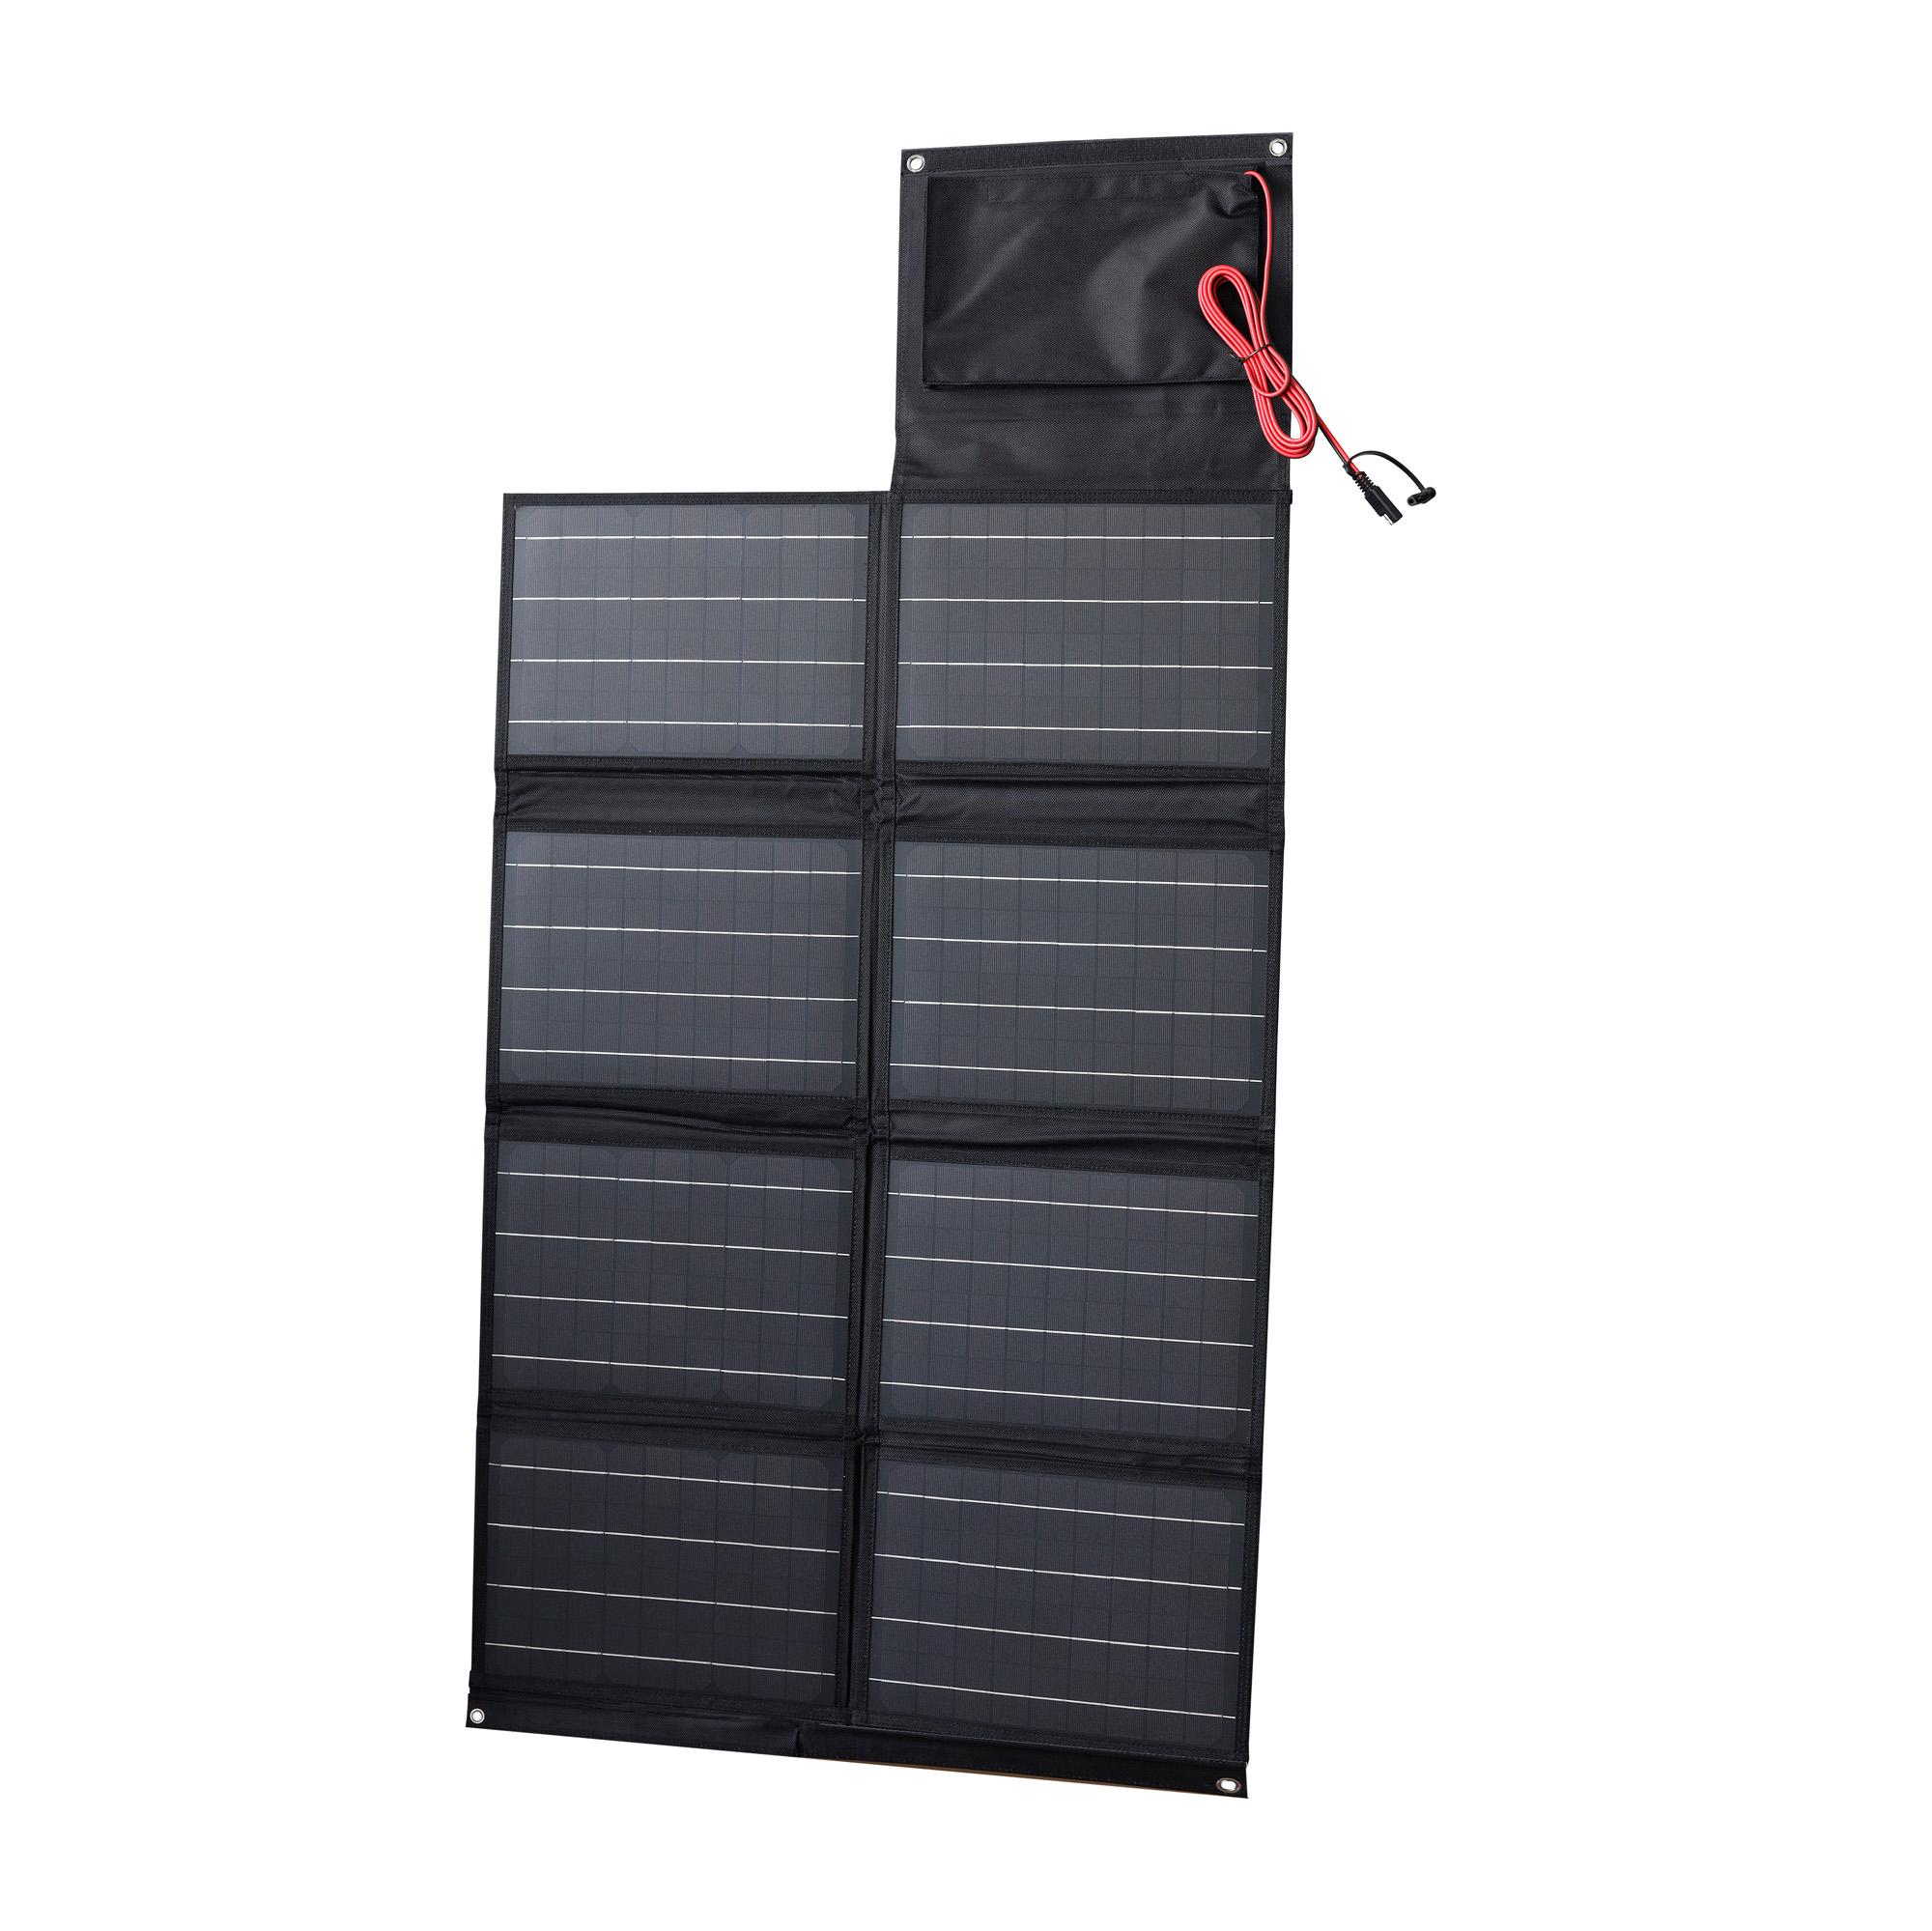 80 Watt Portable Folding Solar Panel